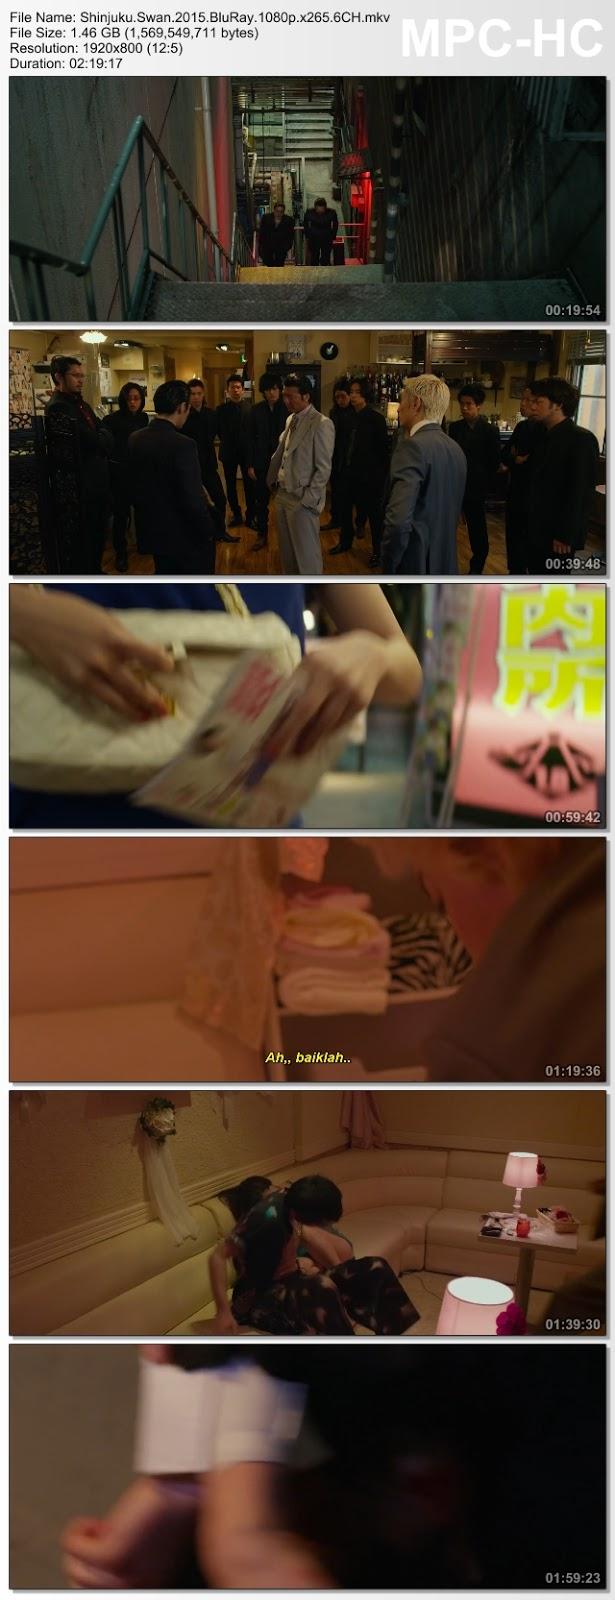 Screenshots Download Film Gratis Shinjuku Suwan (2015) BluRay 480p MP4 Subtitle Bahasa Indonesia 3GP